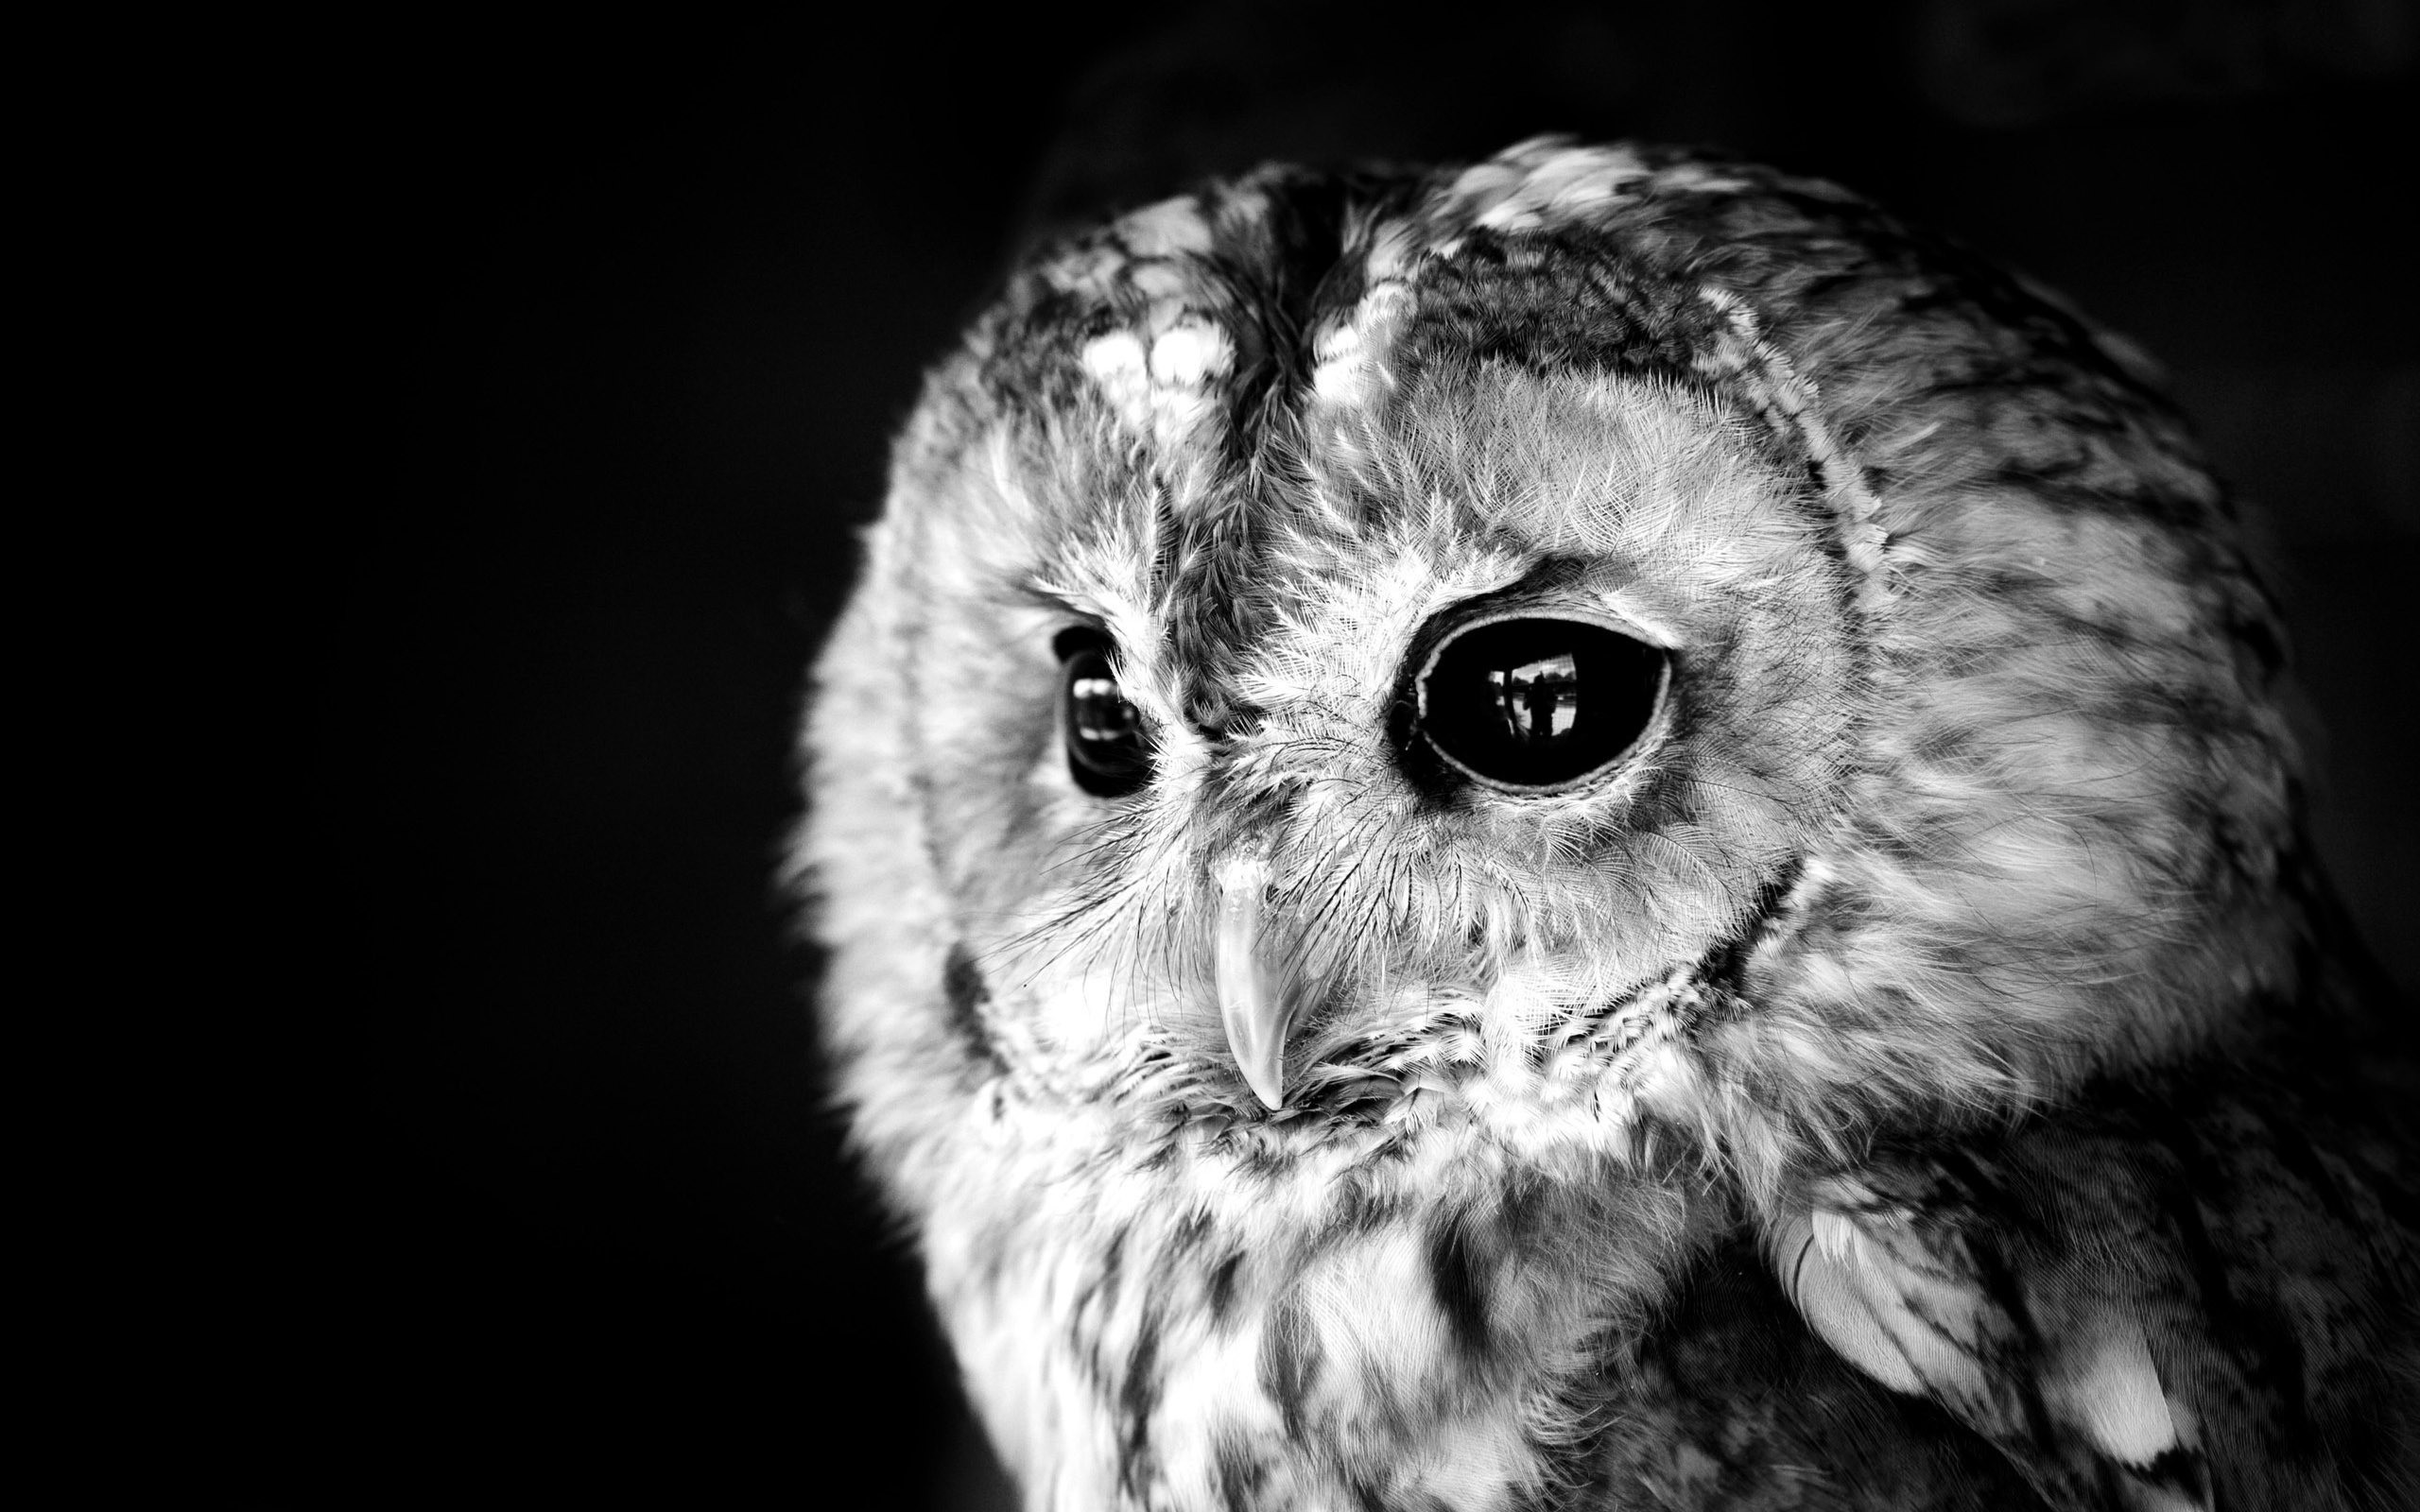 Owl Wallpaper Hd 83 Images